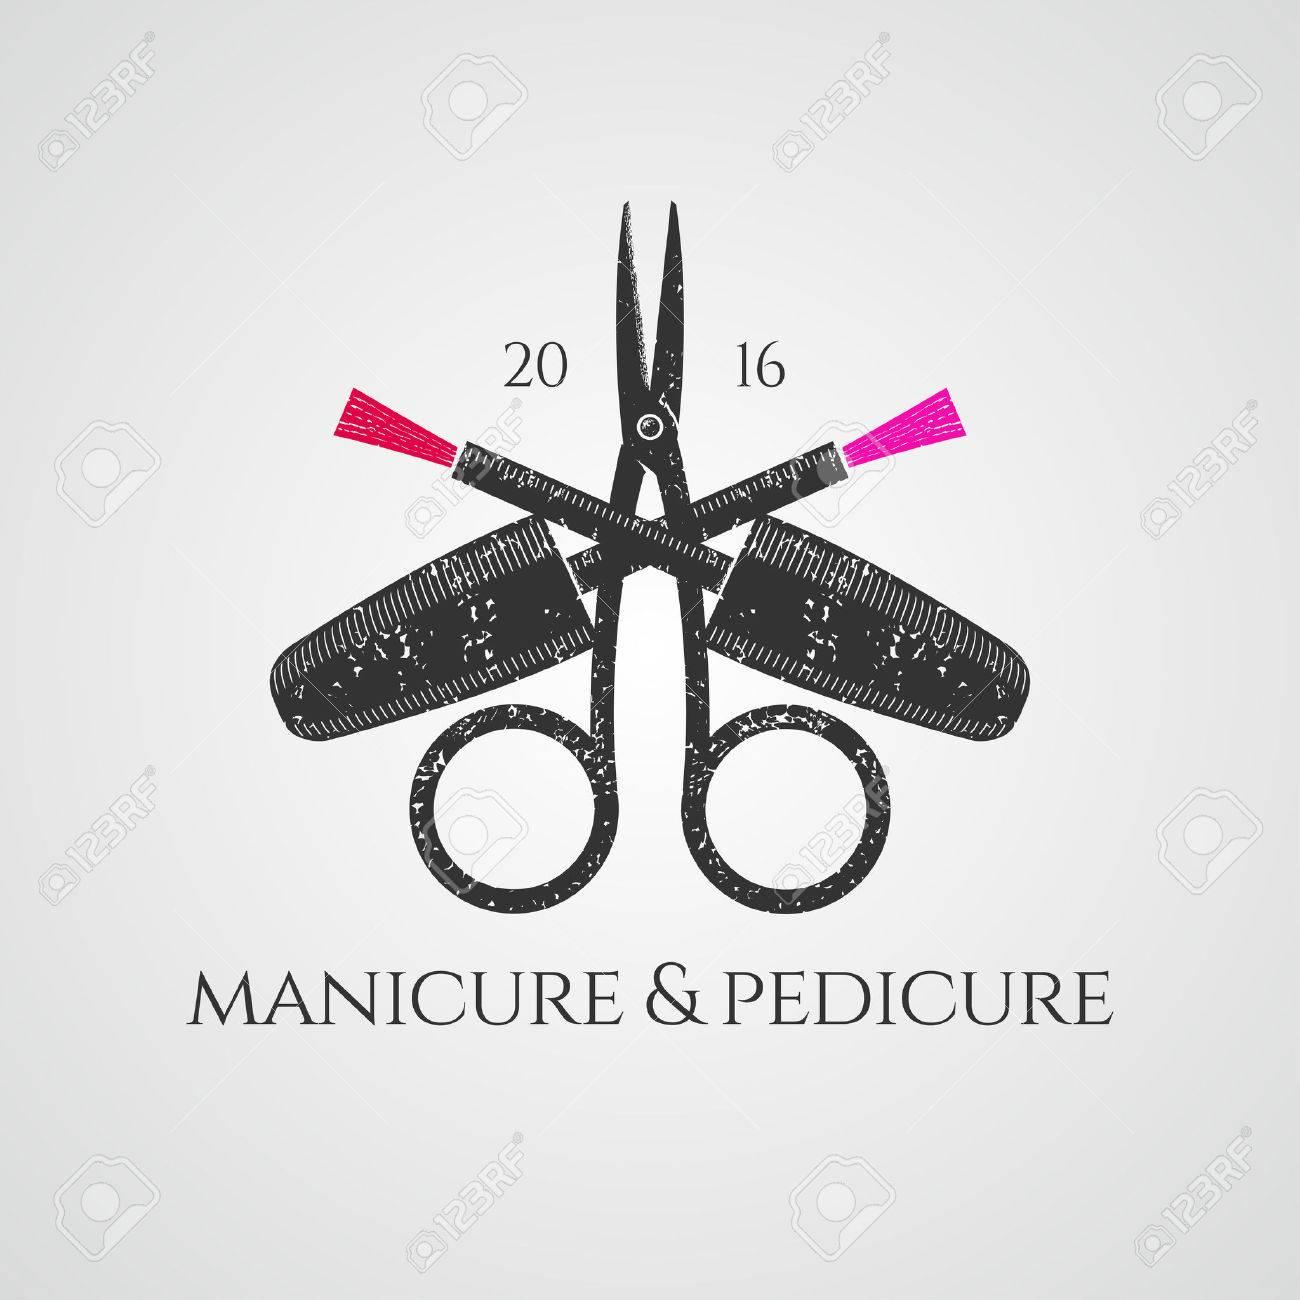 Manicure vector logo. Nonstandard design, colorful illustration - 58114637